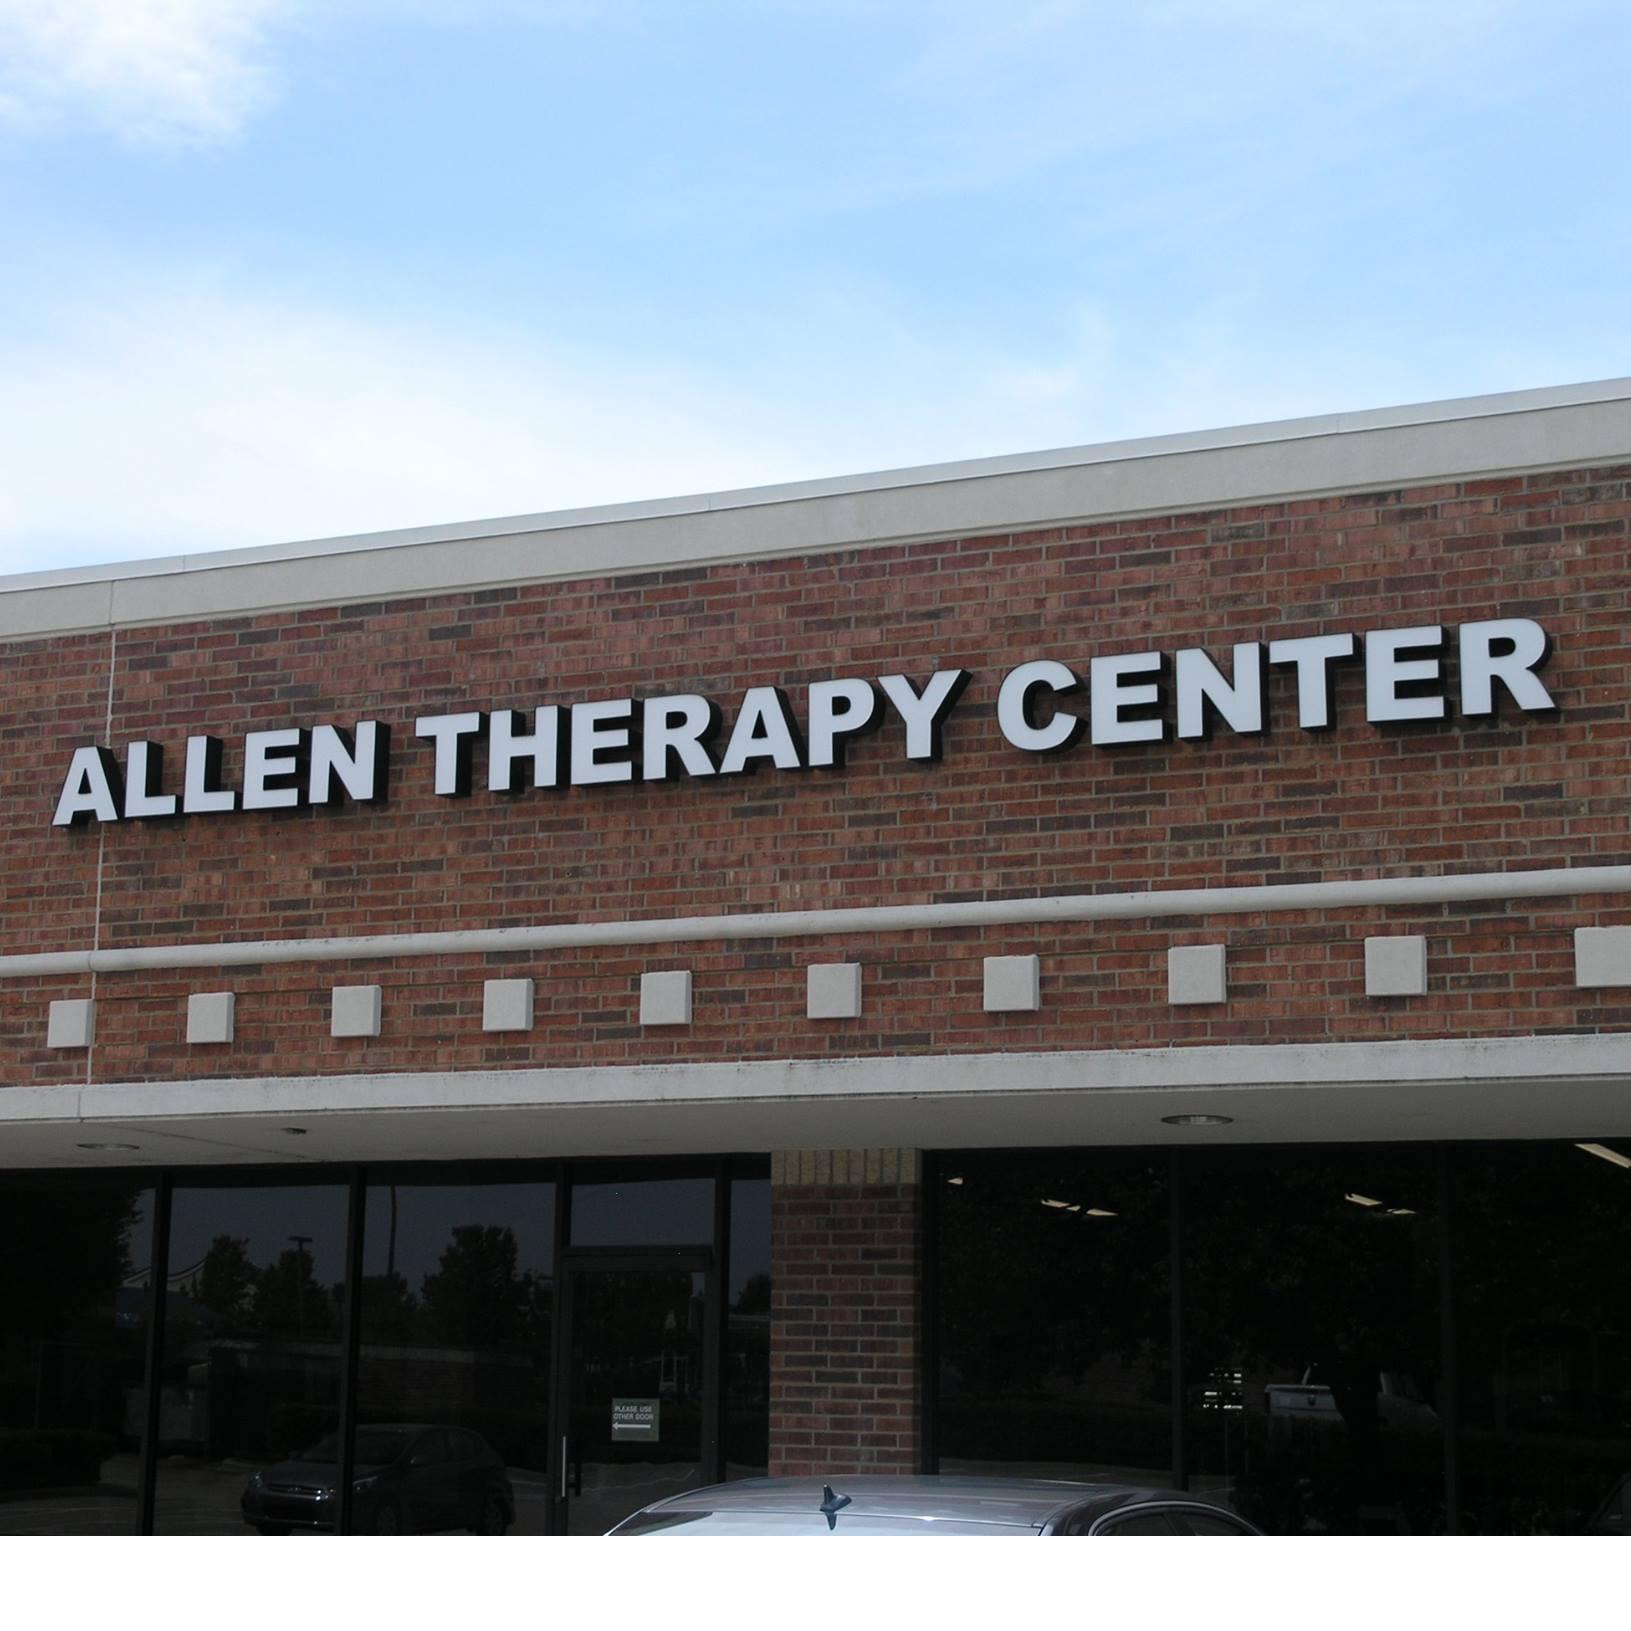 Allen Therapy Center